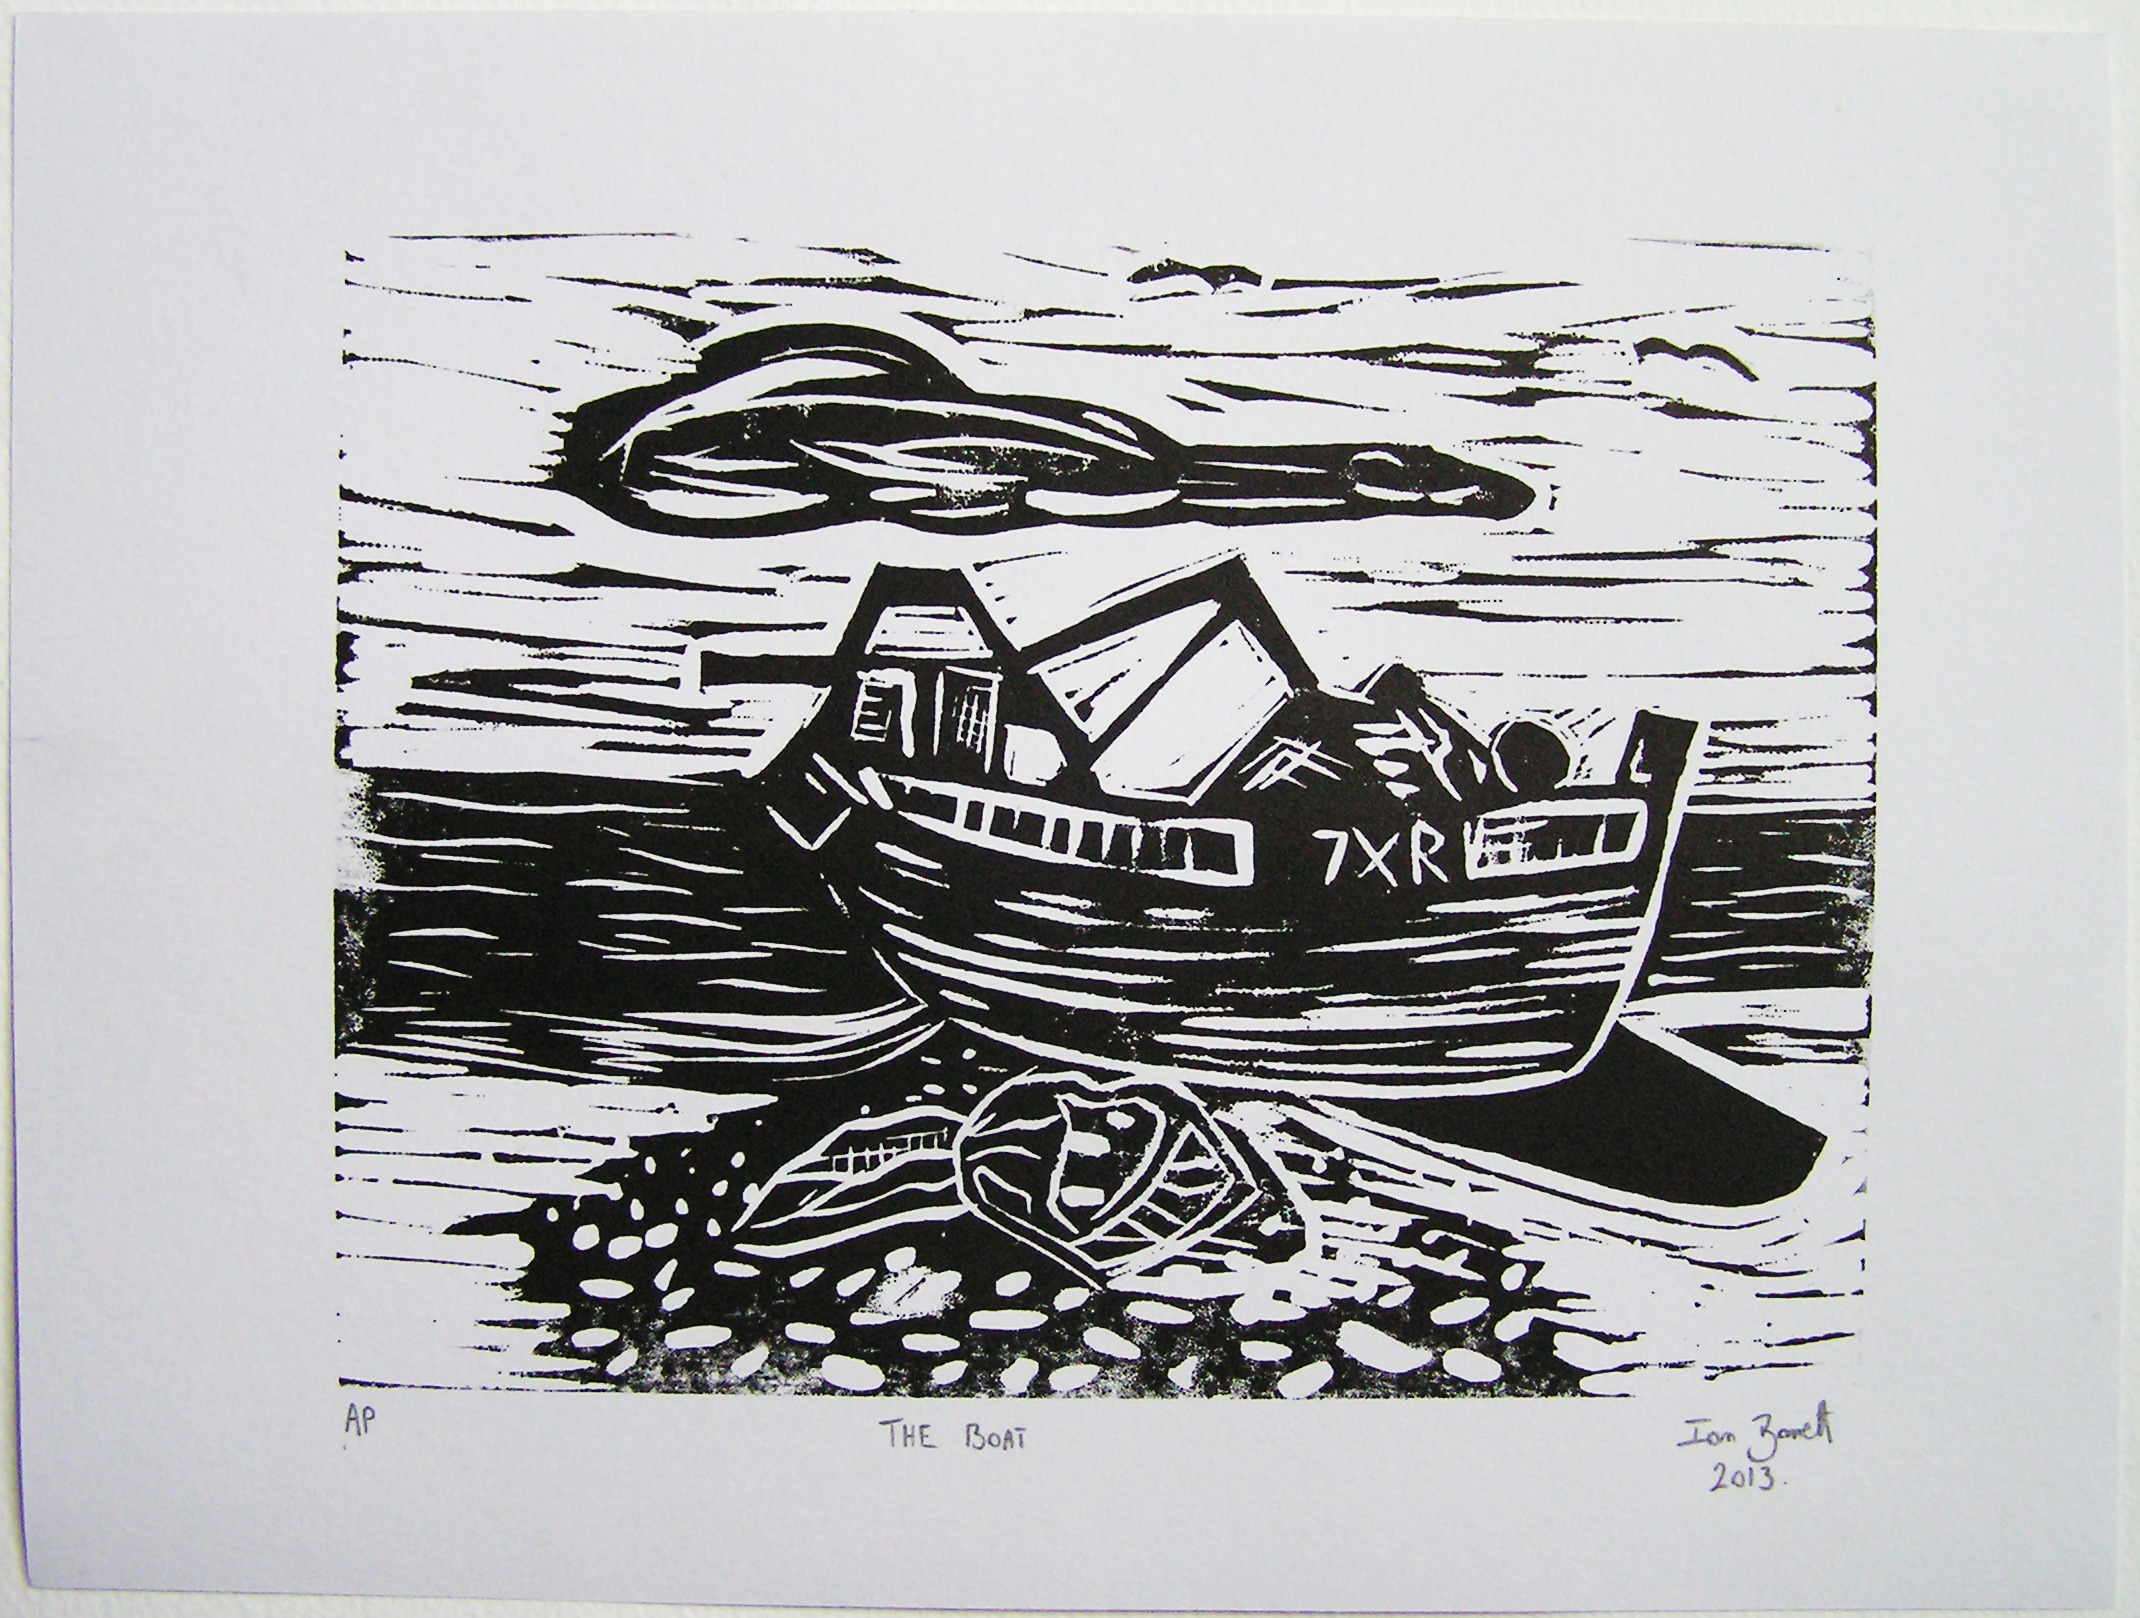 The Boat Ian Barrett A4 Linocut Artists Proof Ian Barrett Art